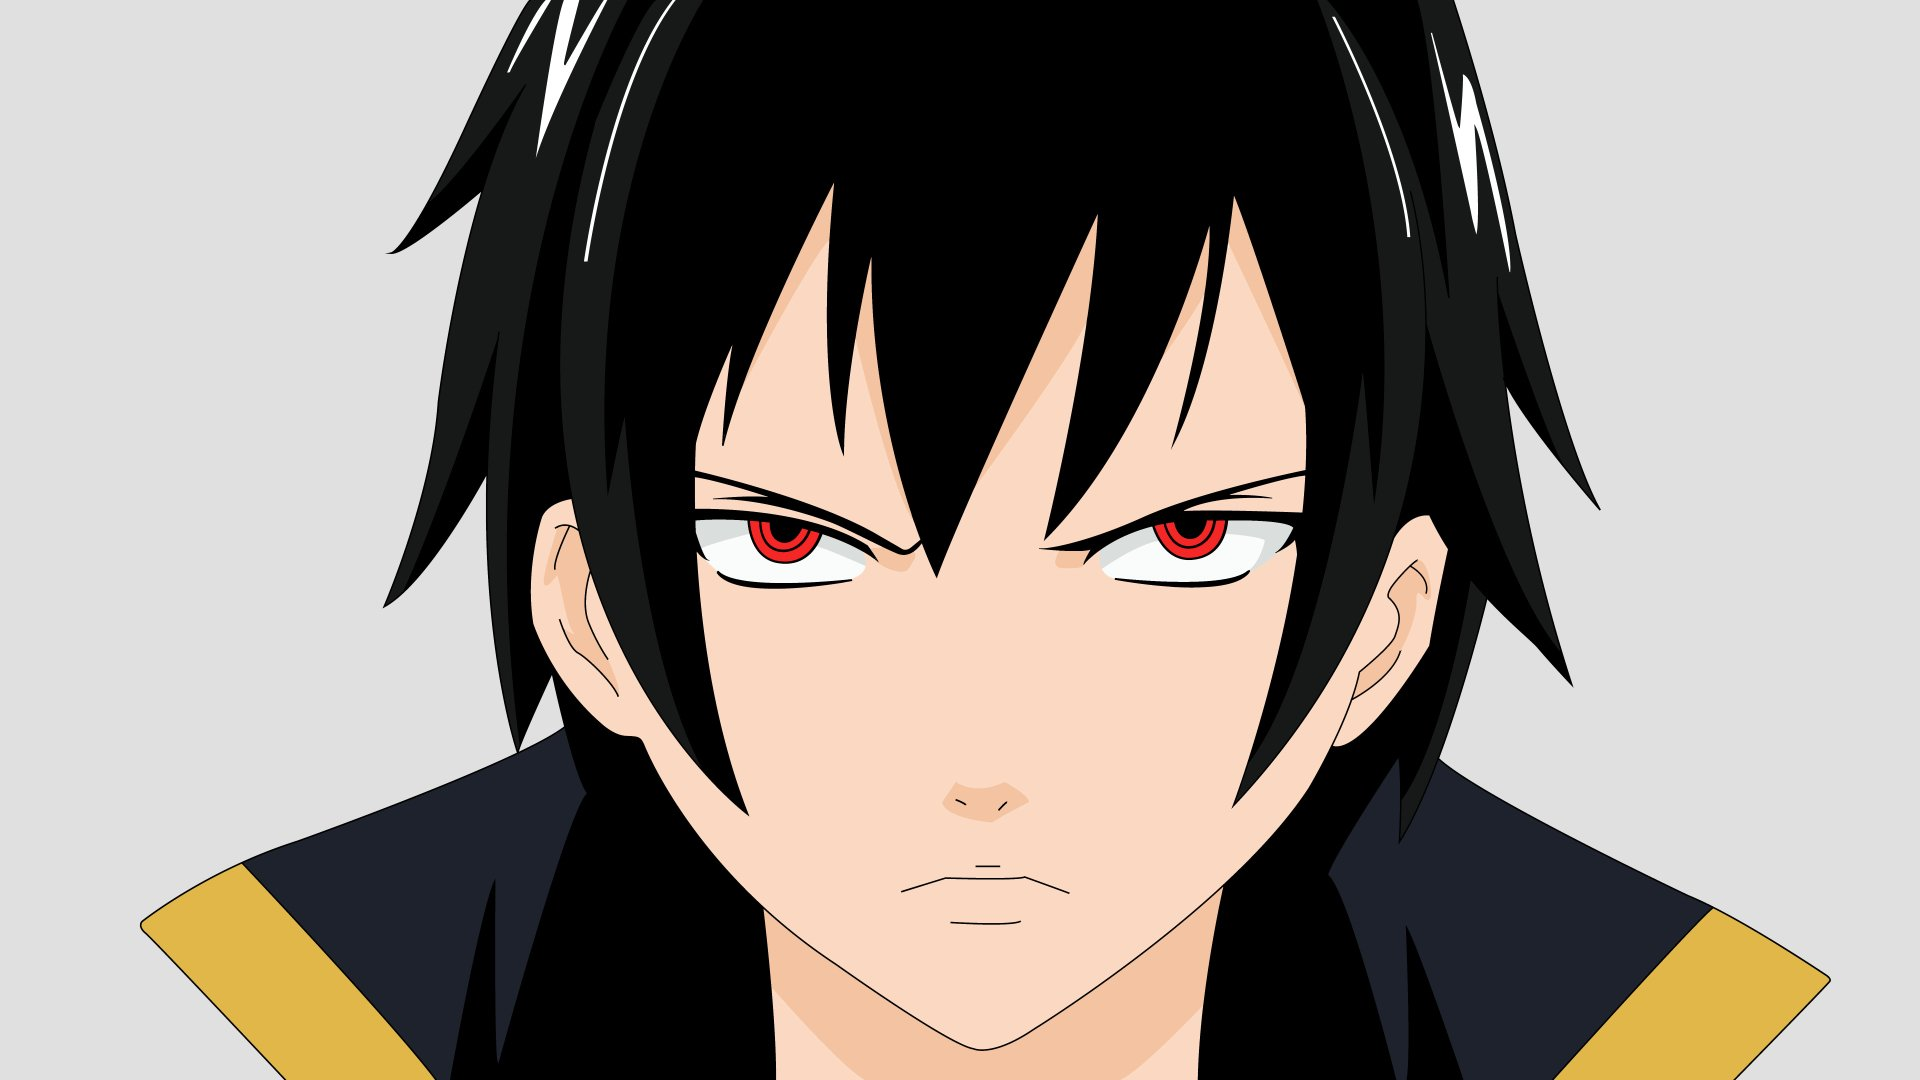 Anime - Fairy Tail  Zeref Dragneel Emperor Spriggan Black Wizard Wallpaper